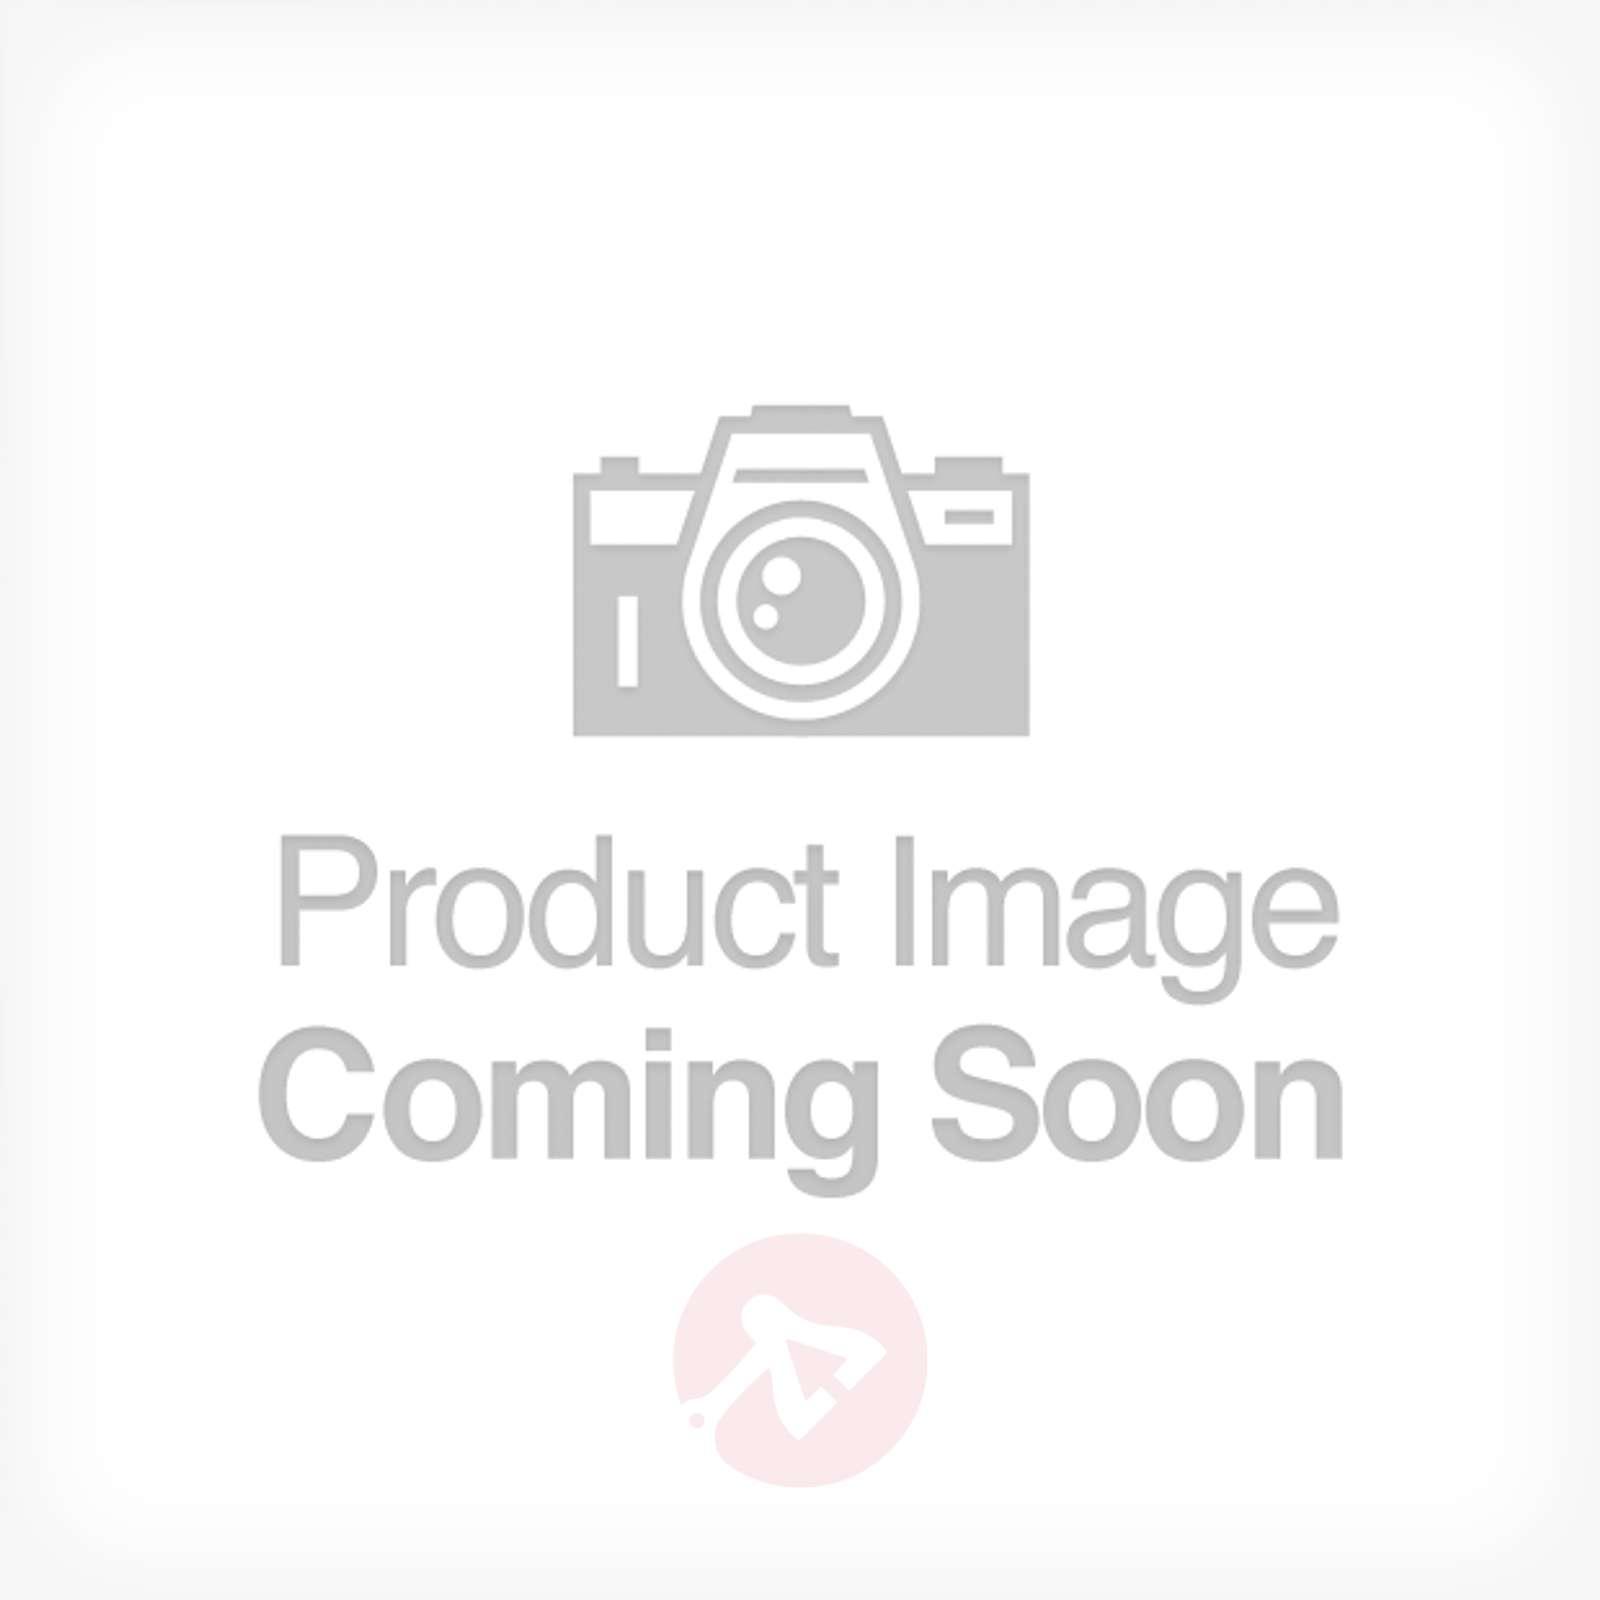 Zac BL modern LED table lamp-1071081X-01